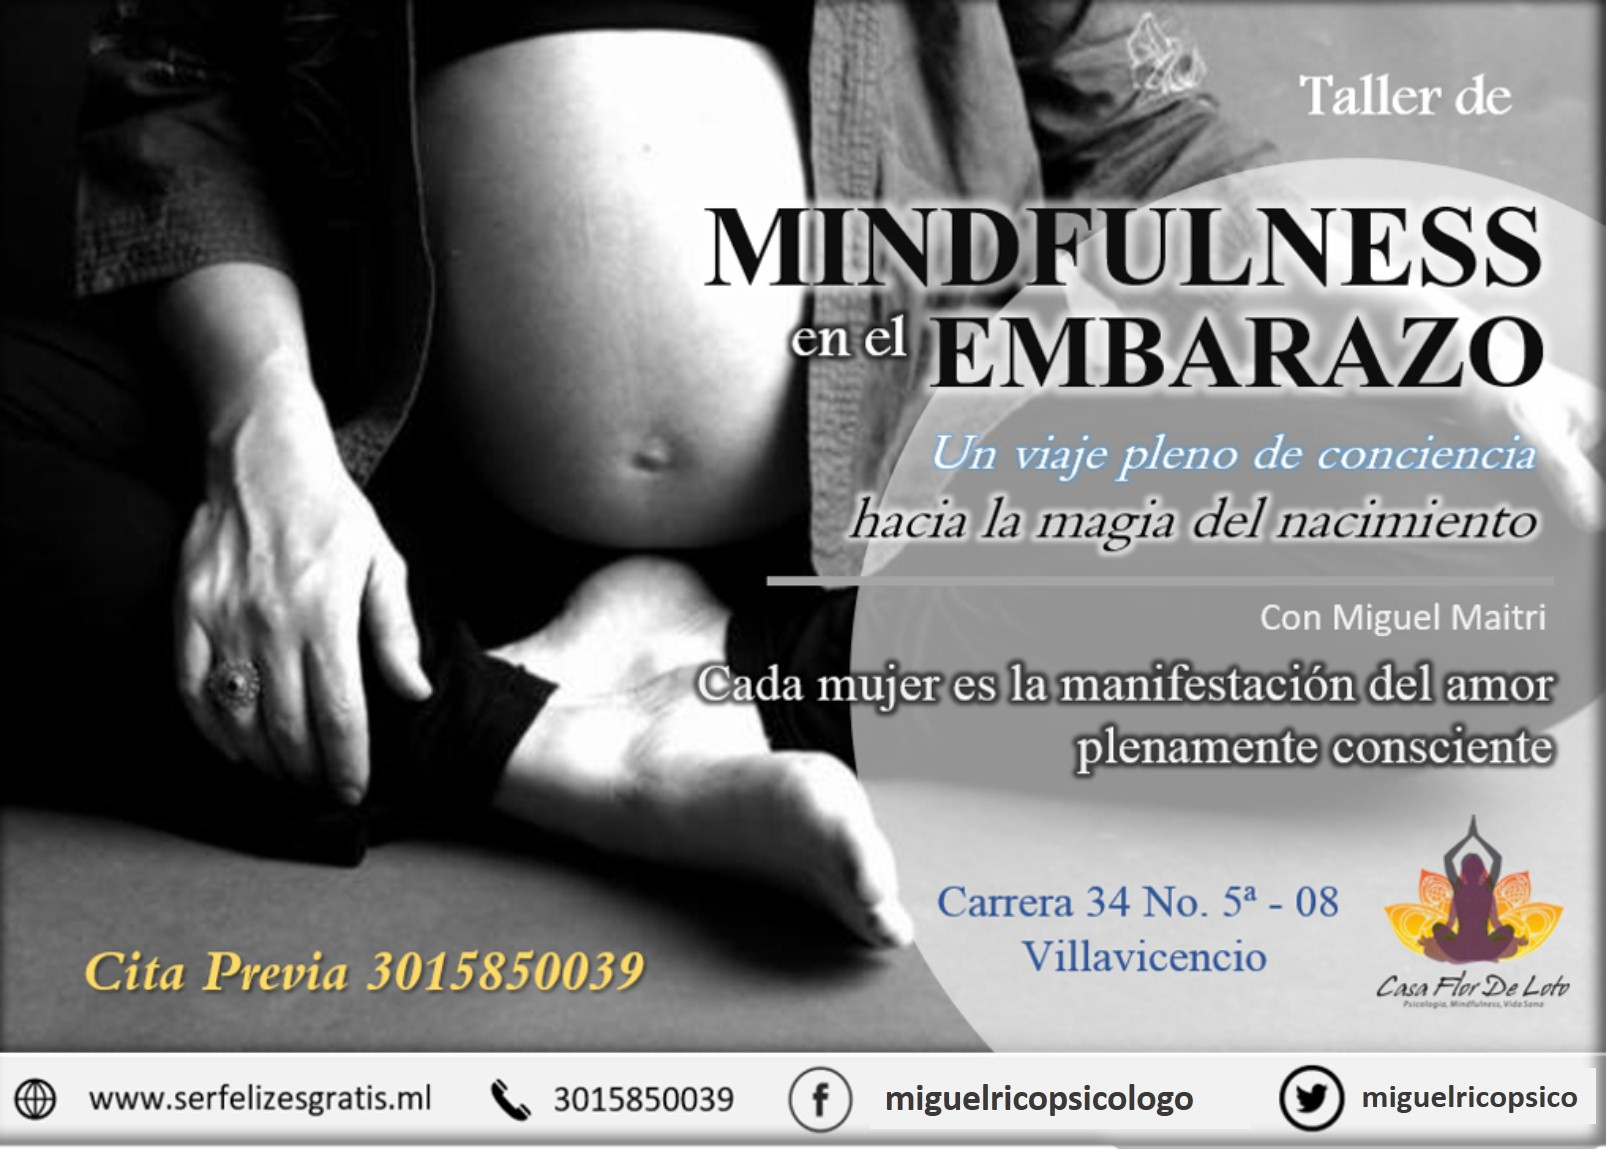 Mindfulness y embarazopngjpg